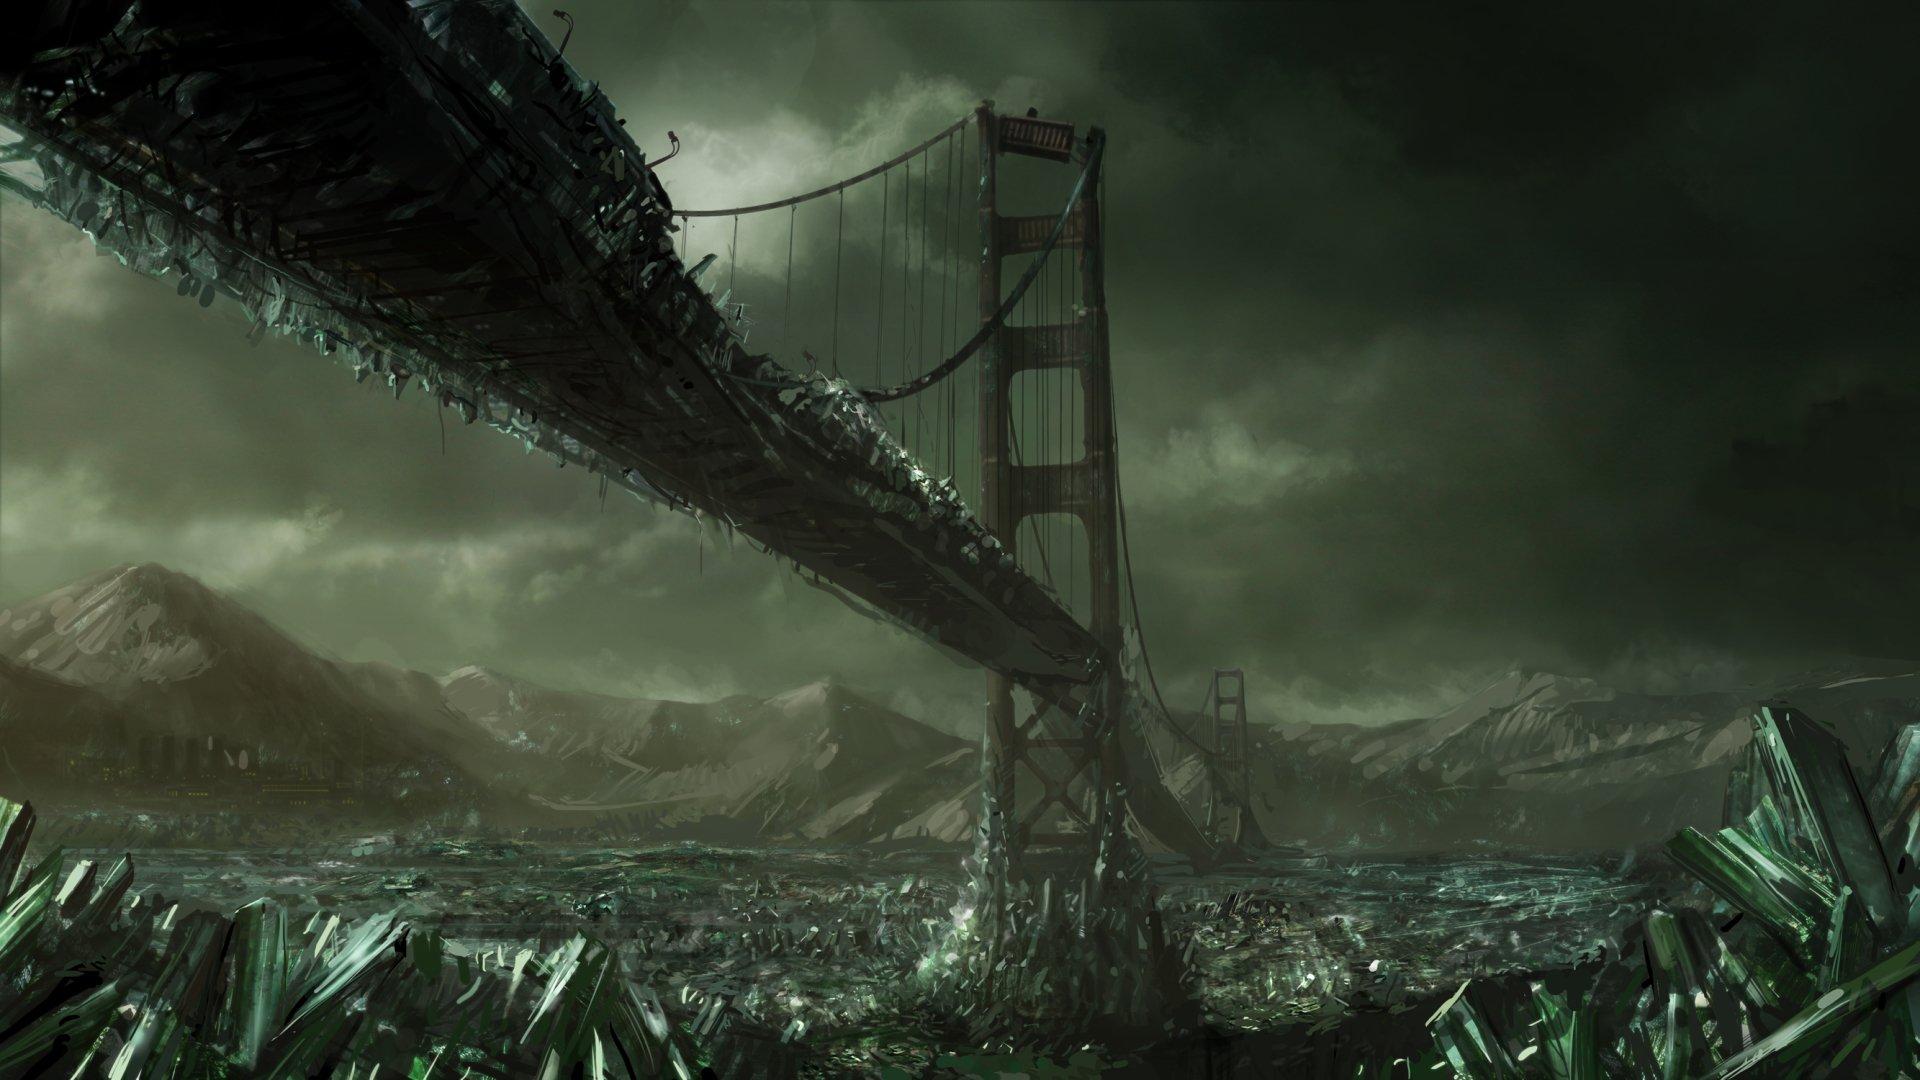 Sci Fi - Post Apocalyptic  Crystal Bridge Wallpaper